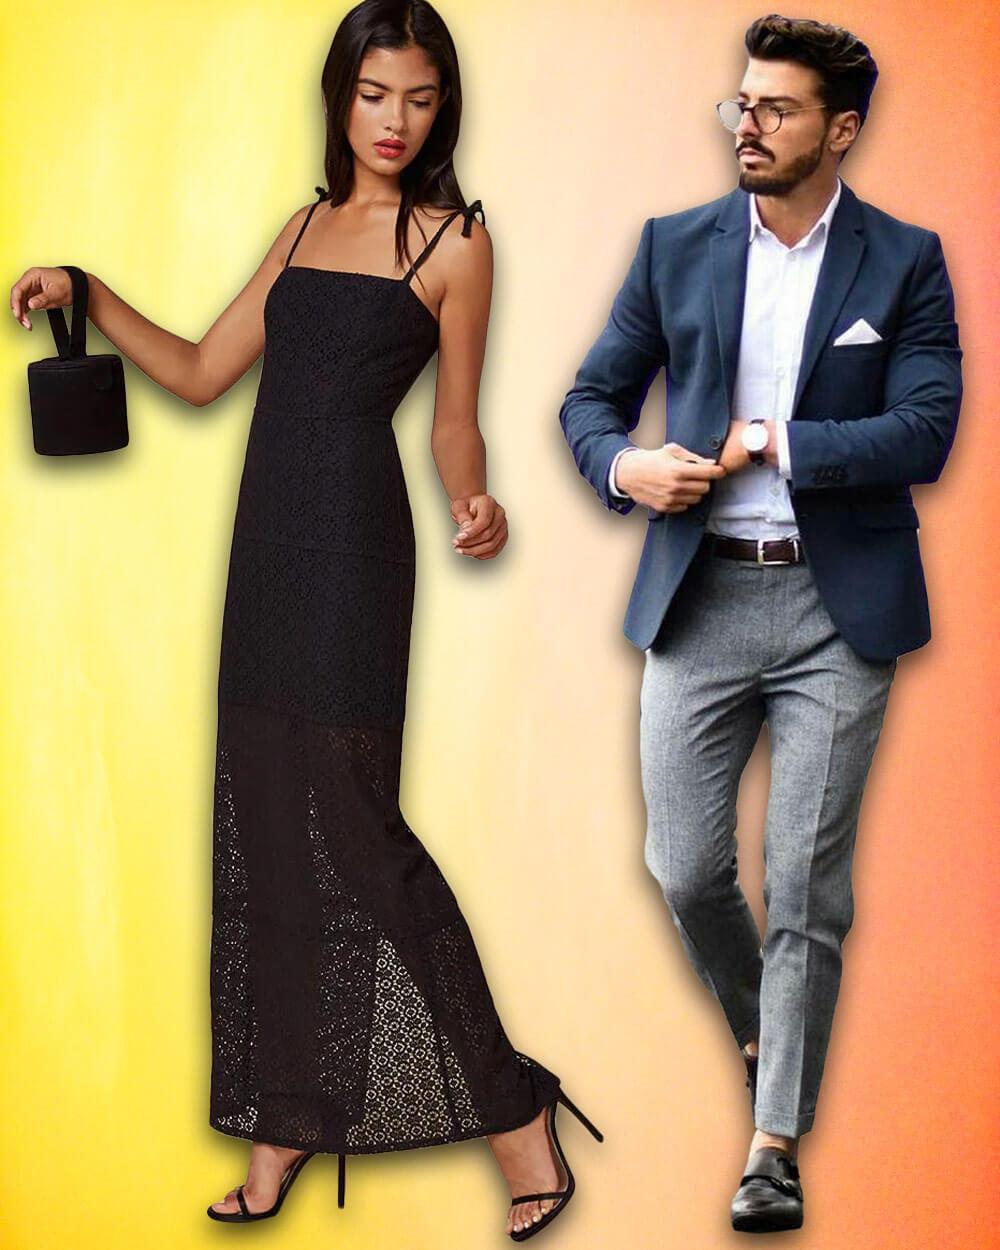 Semi-formal casino fashion and clothing